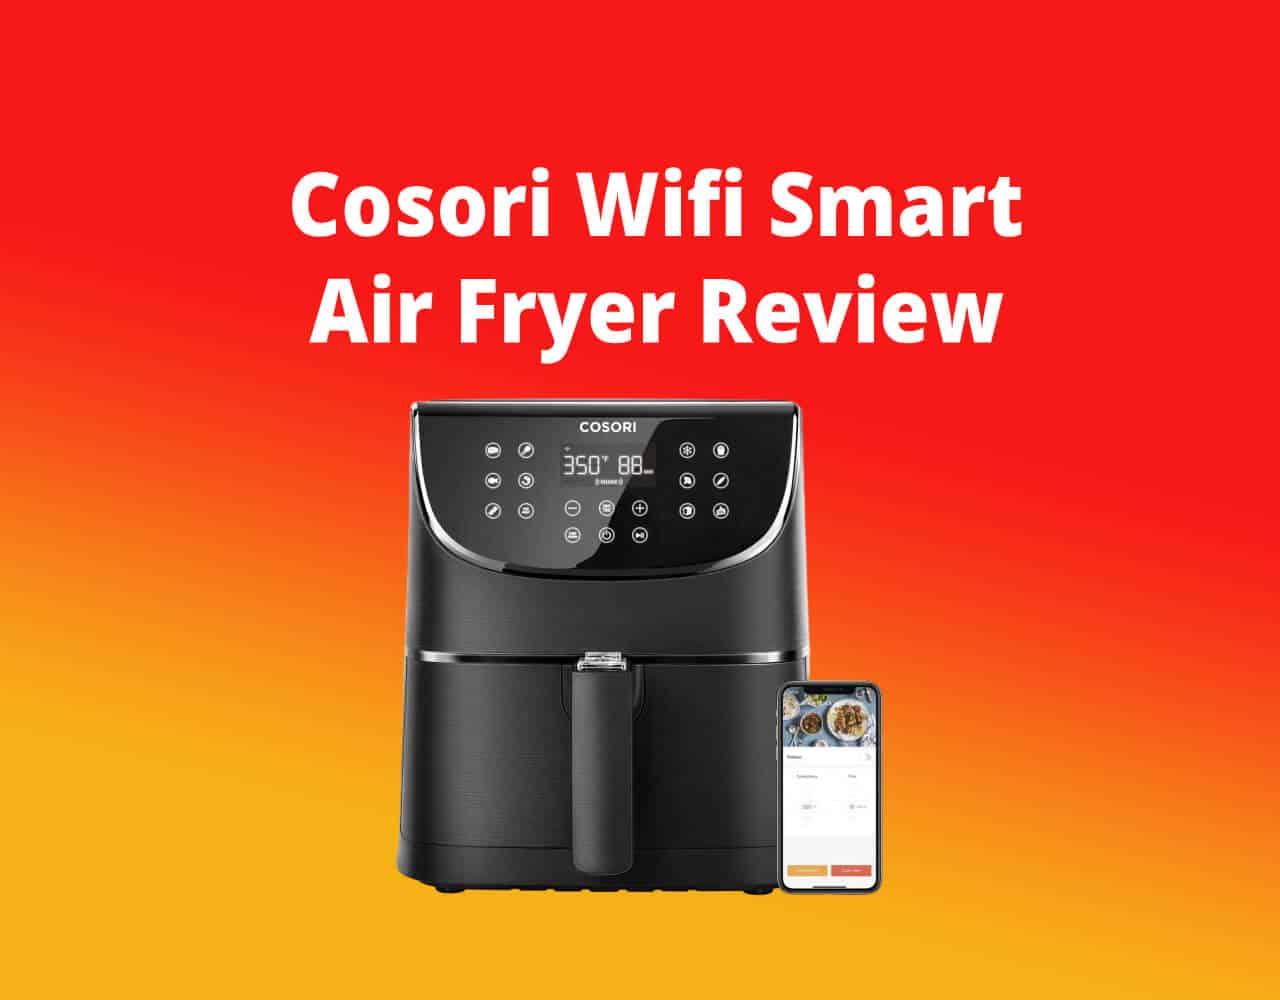 Cosori Wifi Smart Air Fryer review